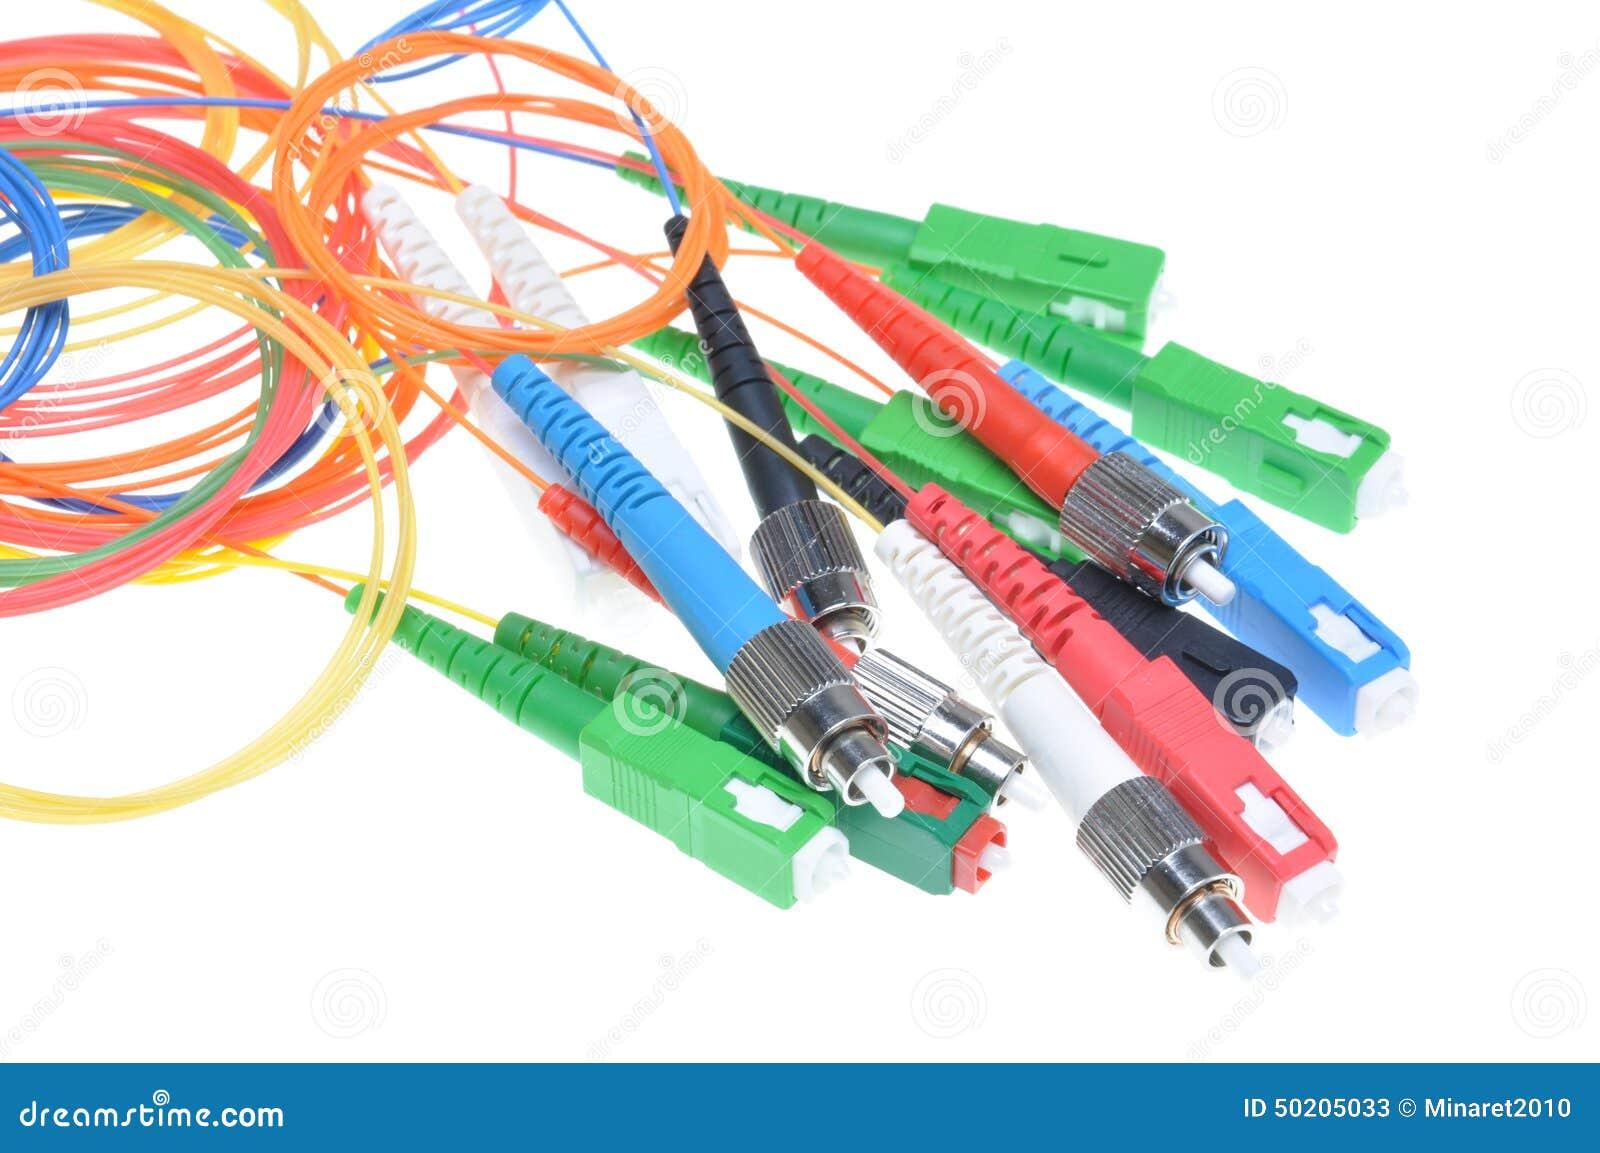 fiber optics in telecommunication Fiber optic communications ee4367 telecom switching & transmission prof murat torlak optical fibers fiber optics (optical fibers) are long, thin strands of very.